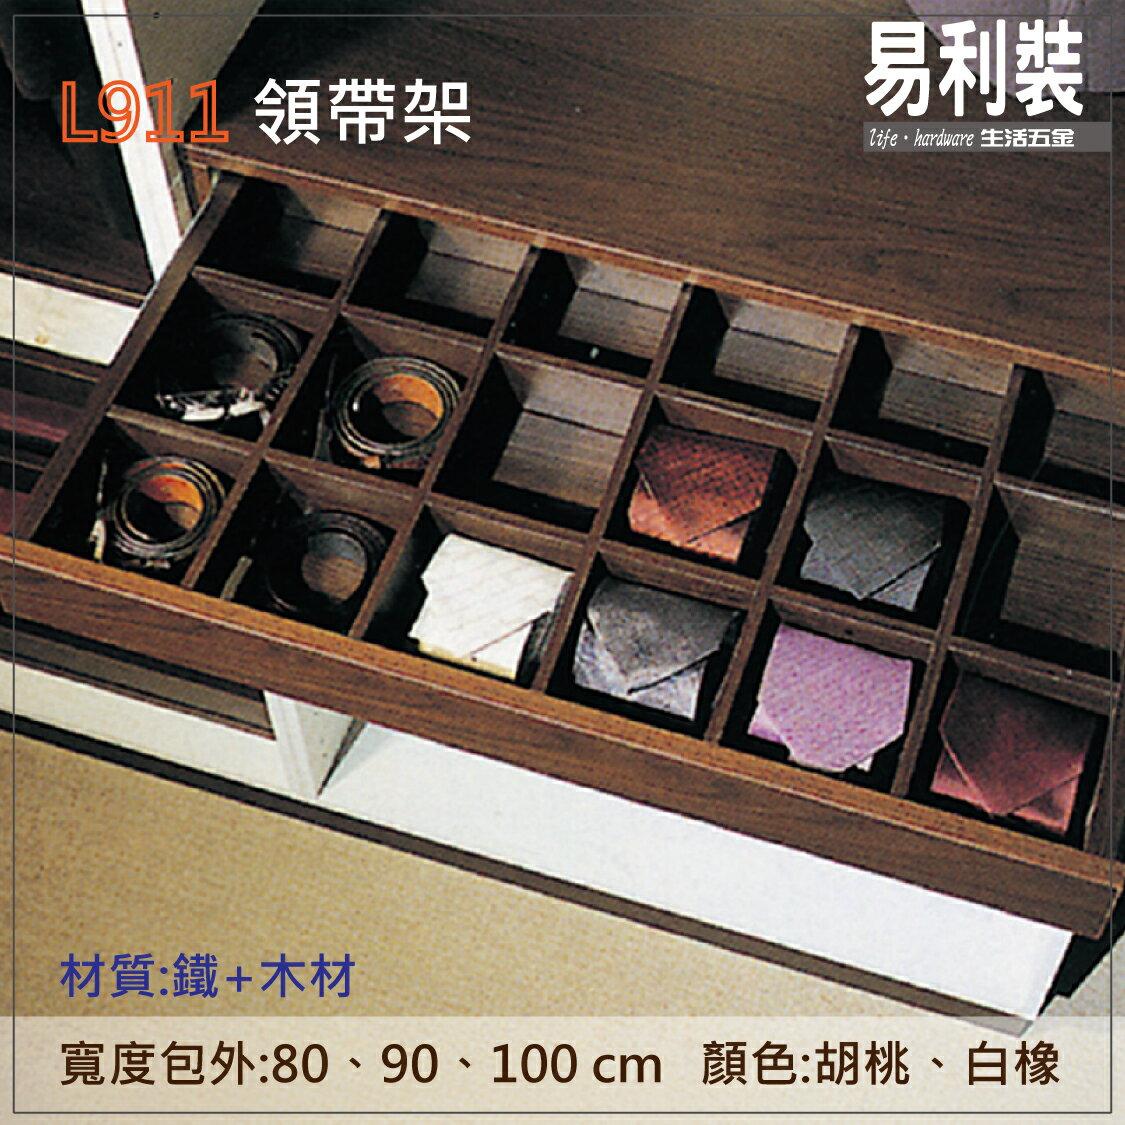 【 EASYCAN  】L911 領帶架 易利裝生活五金 衣櫃 房間 臥房 衣櫃 小資族 辦公家具 系統家具 0